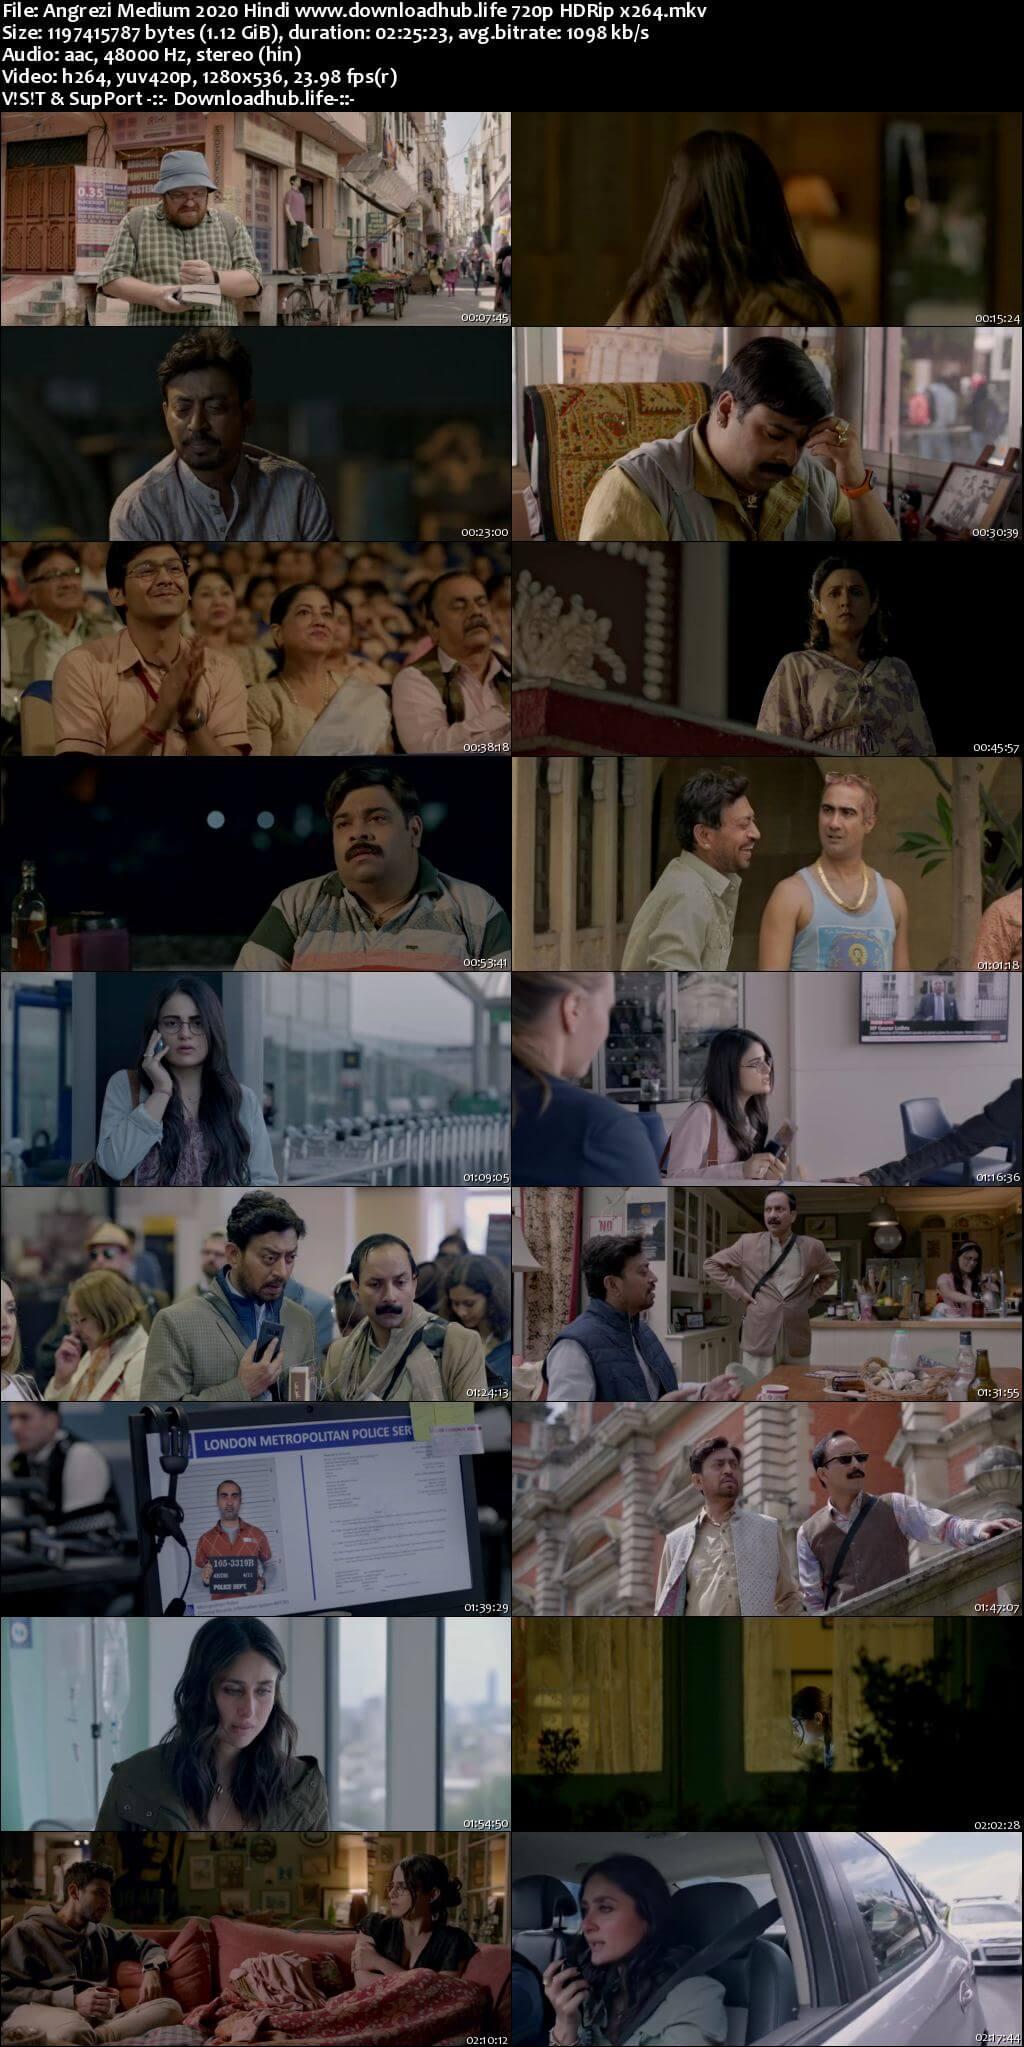 Angrezi Medium 2020 Hindi 720p HDRip x264